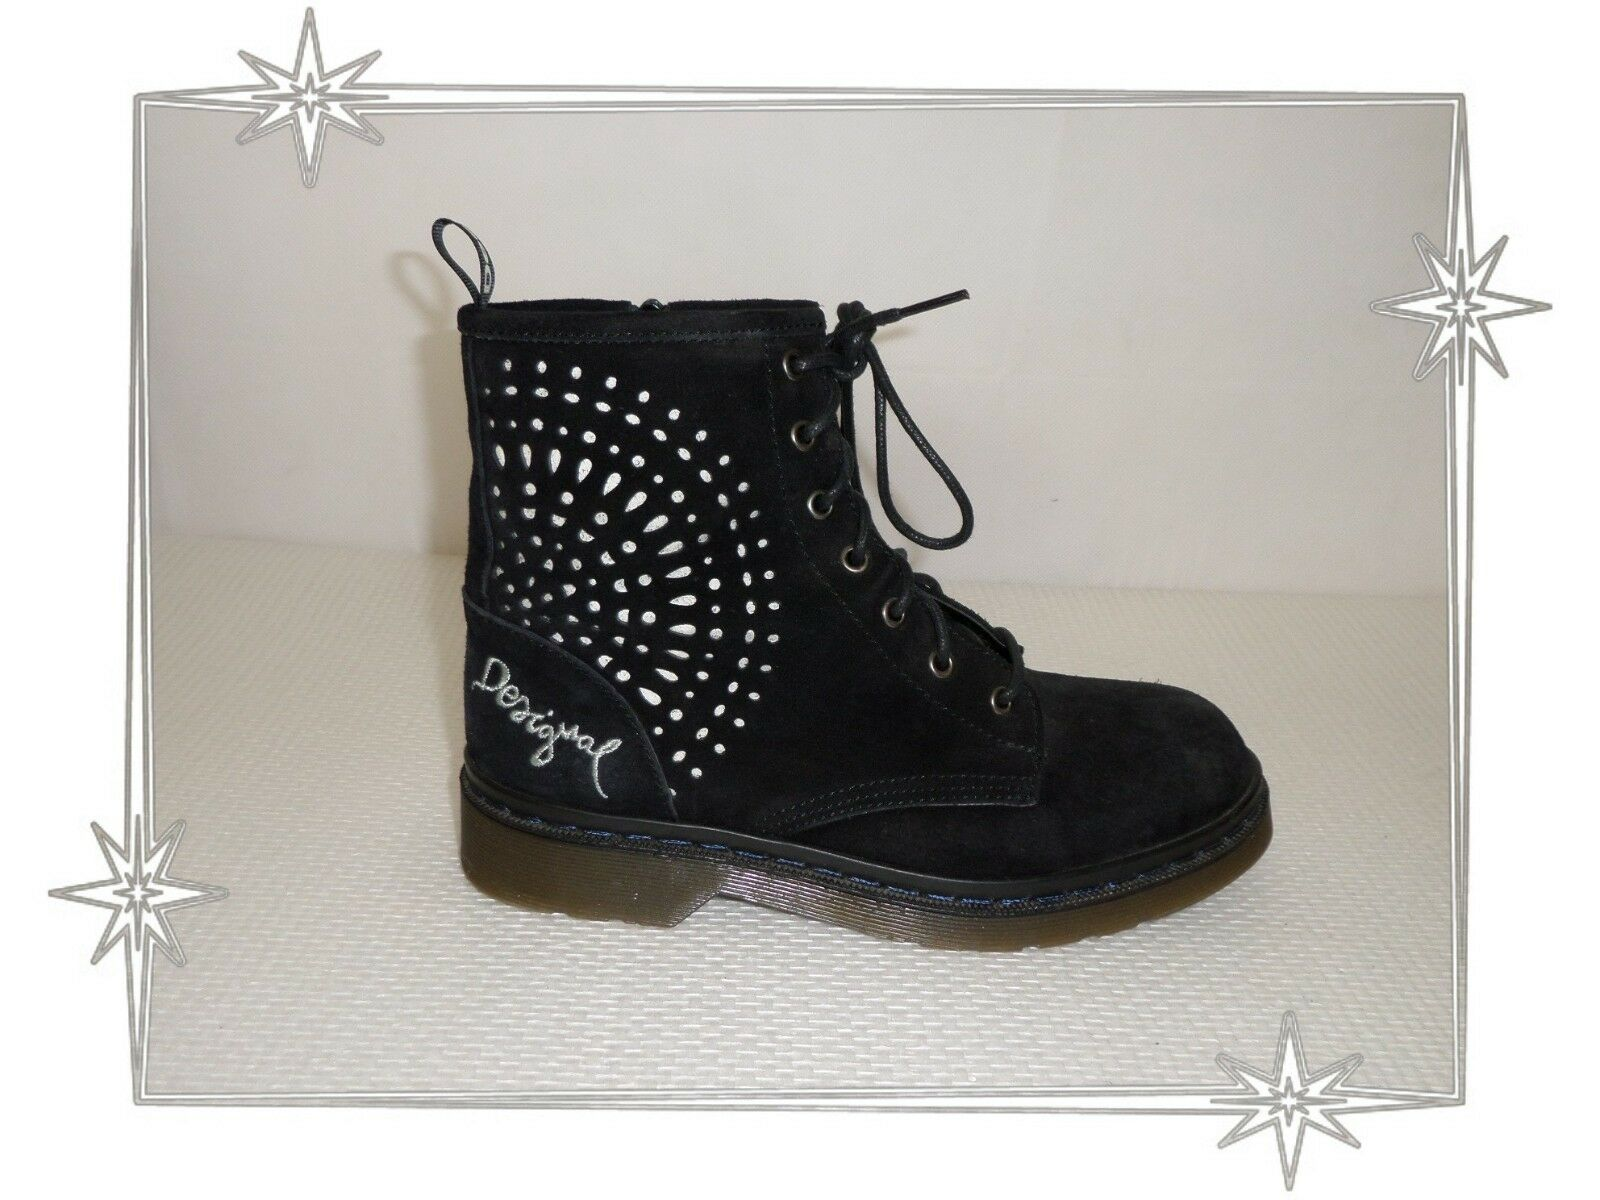 D  -  Bottines botas Fantaisies negroes  Daim Desigual Pointure 38